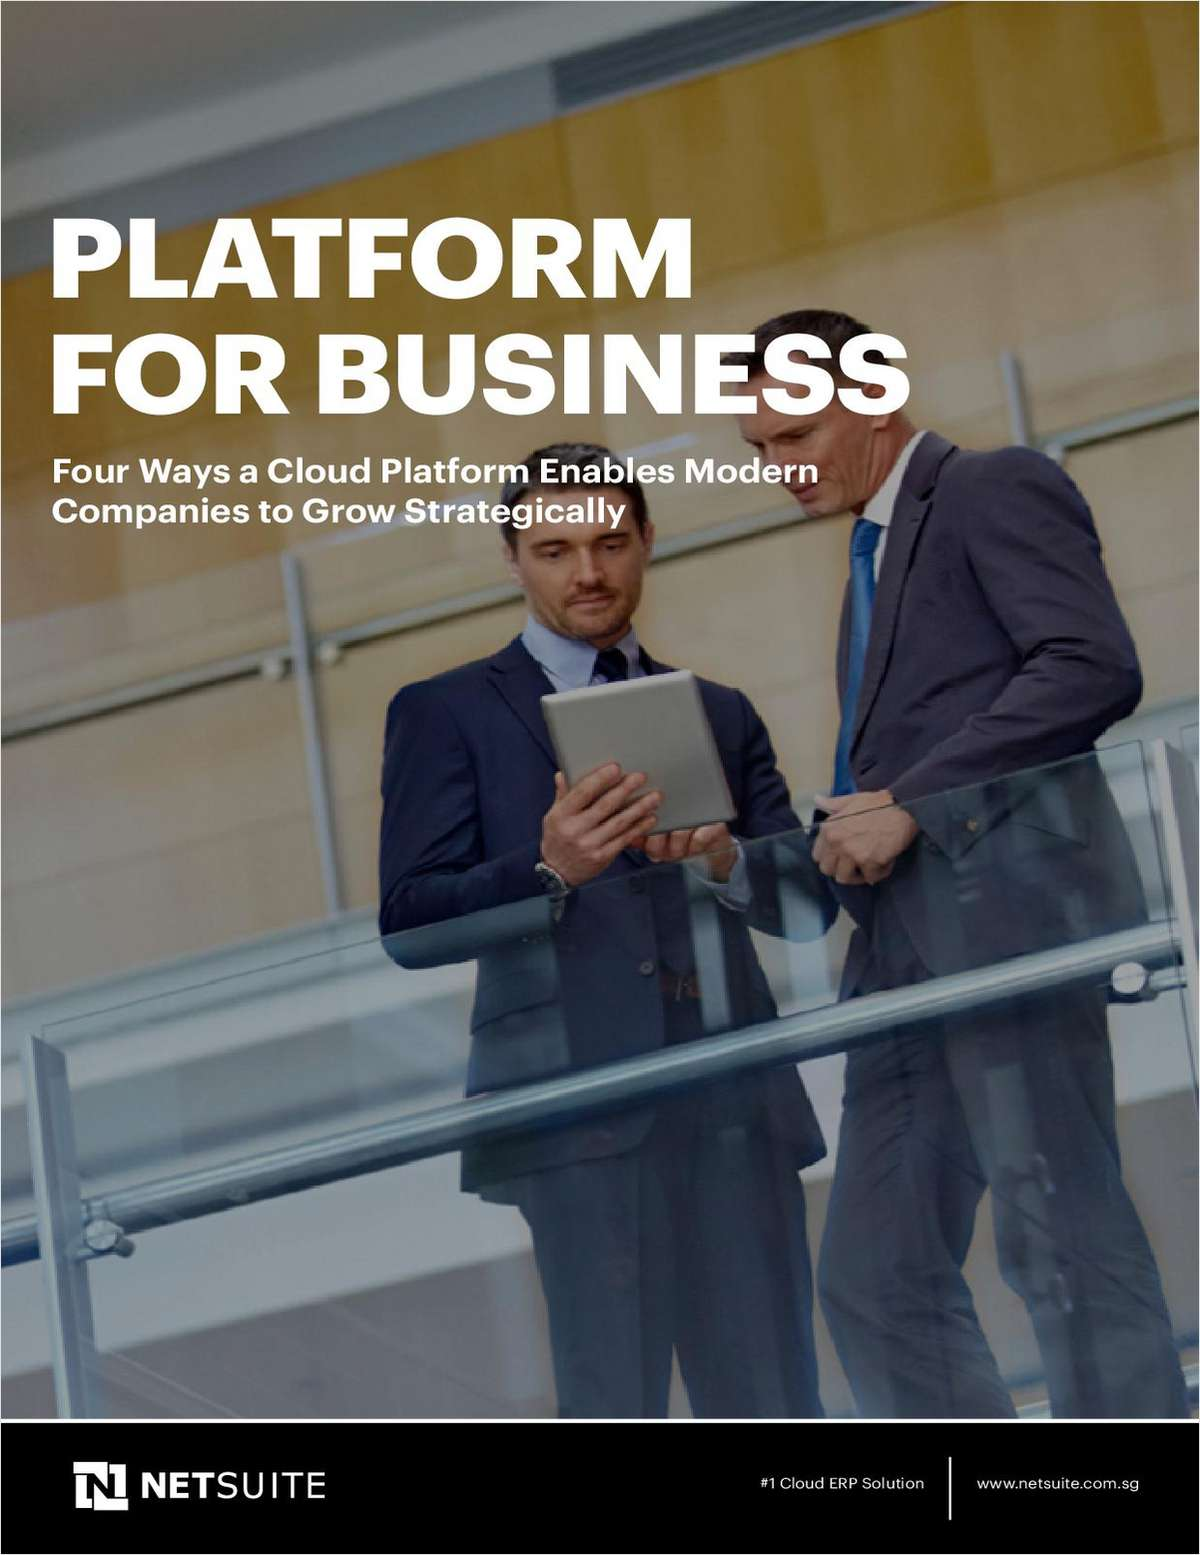 4 Ways a Cloud Platform Enables Strategic Growth